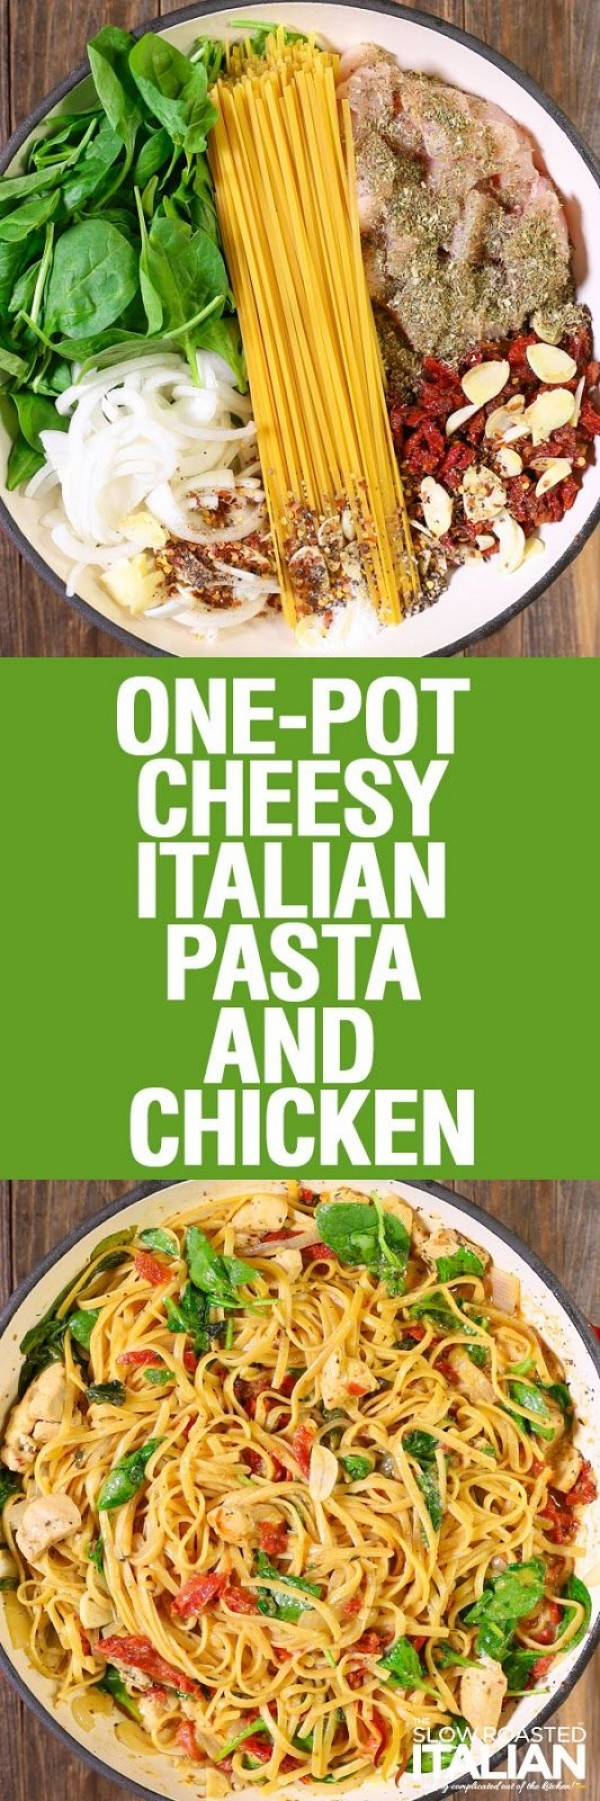 Get the recipe Cheesy Italian Pasta and Chicken @recipes_to_go